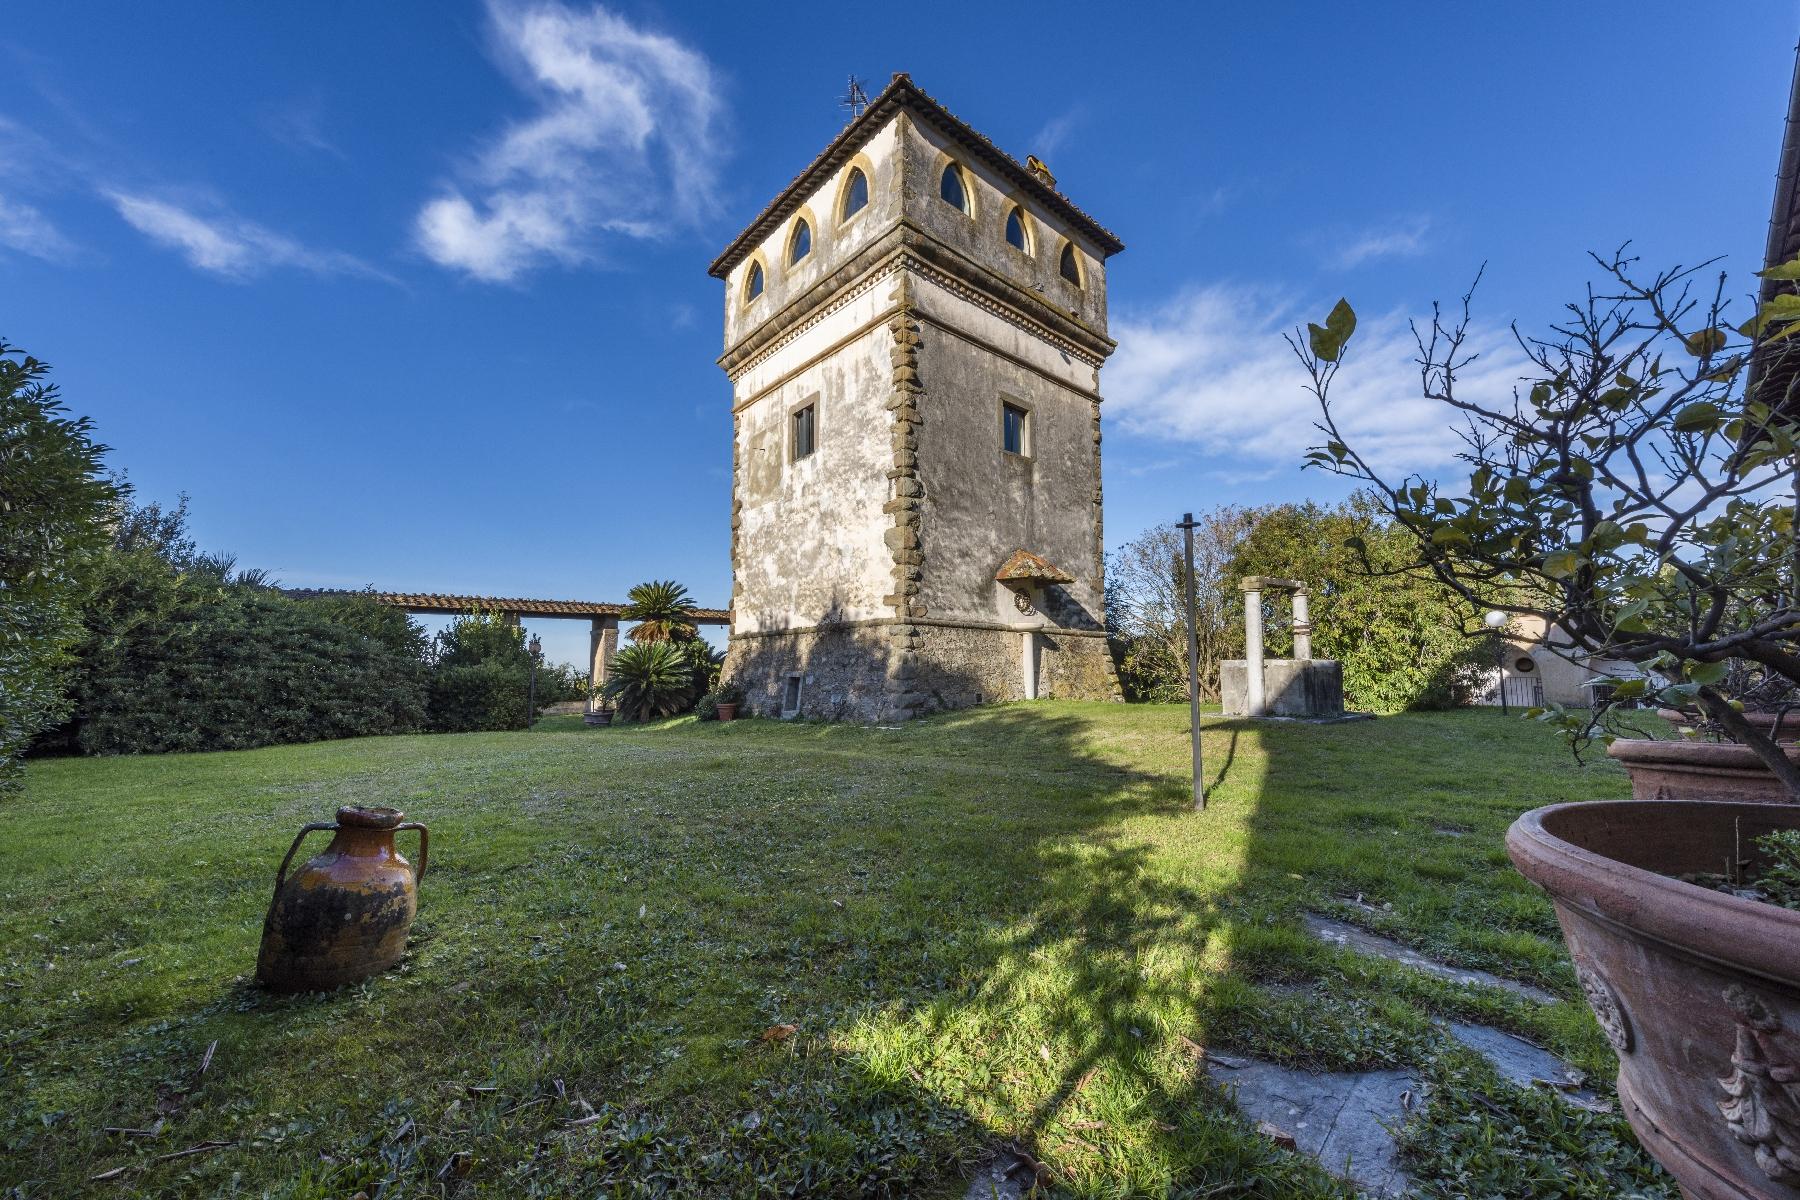 Villa in Vendita a Camaiore: 5 locali, 2800 mq - Foto 10